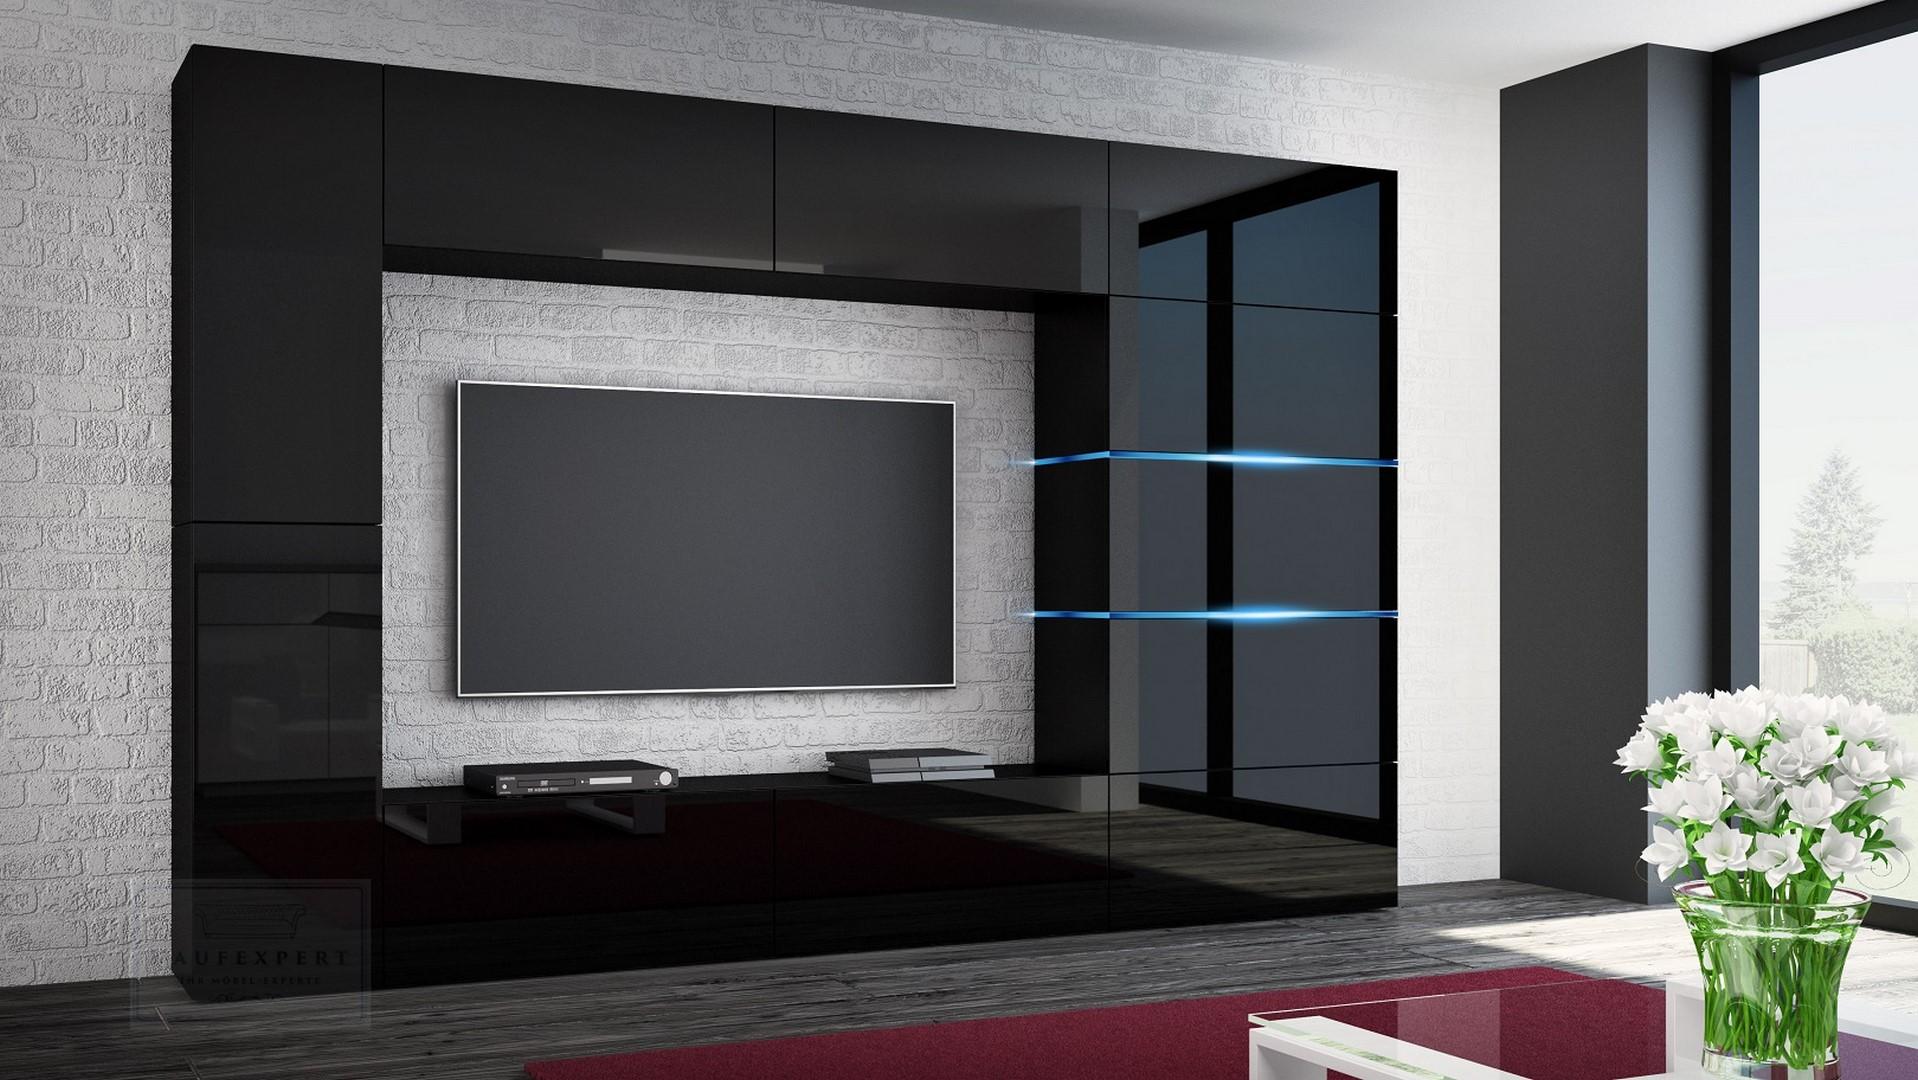 Schon Wohnwand Shadow Schwarz Hochglanz 285 Cm Mediawand Anbauwand Medienwand  Design Modern Led Beleuchtung MDF Hochglanz Stehend